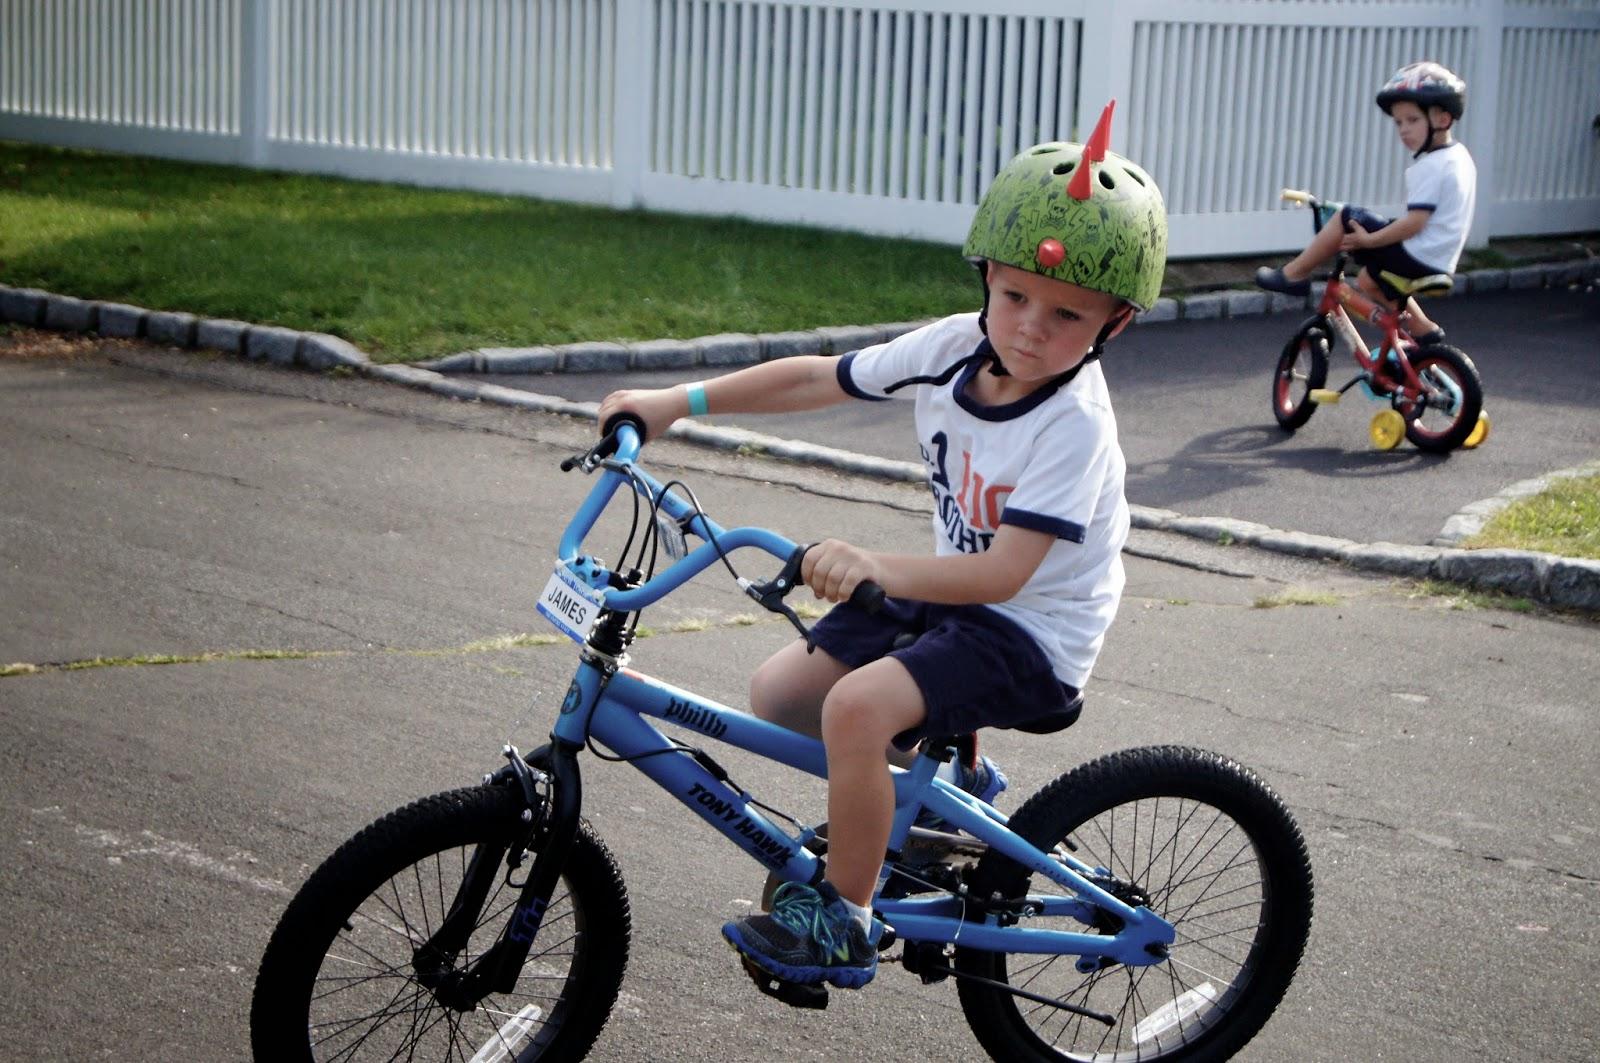 5 year old riding bike